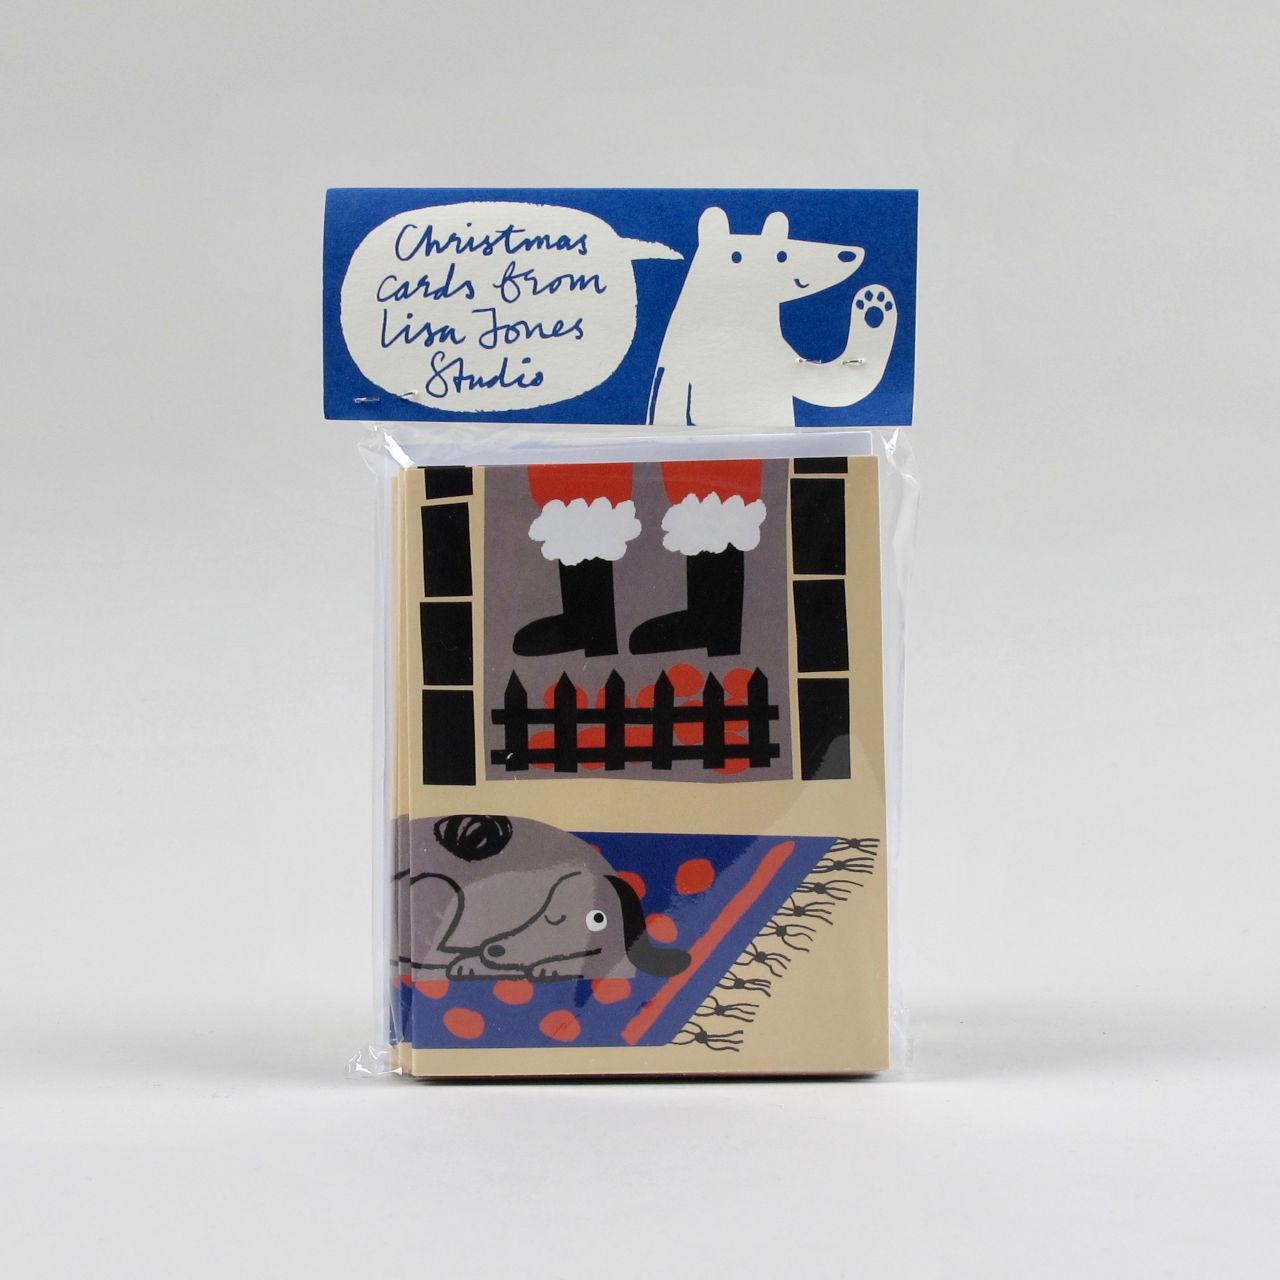 Lisa Jones Christmas Card - Pack of 10 - Design 1